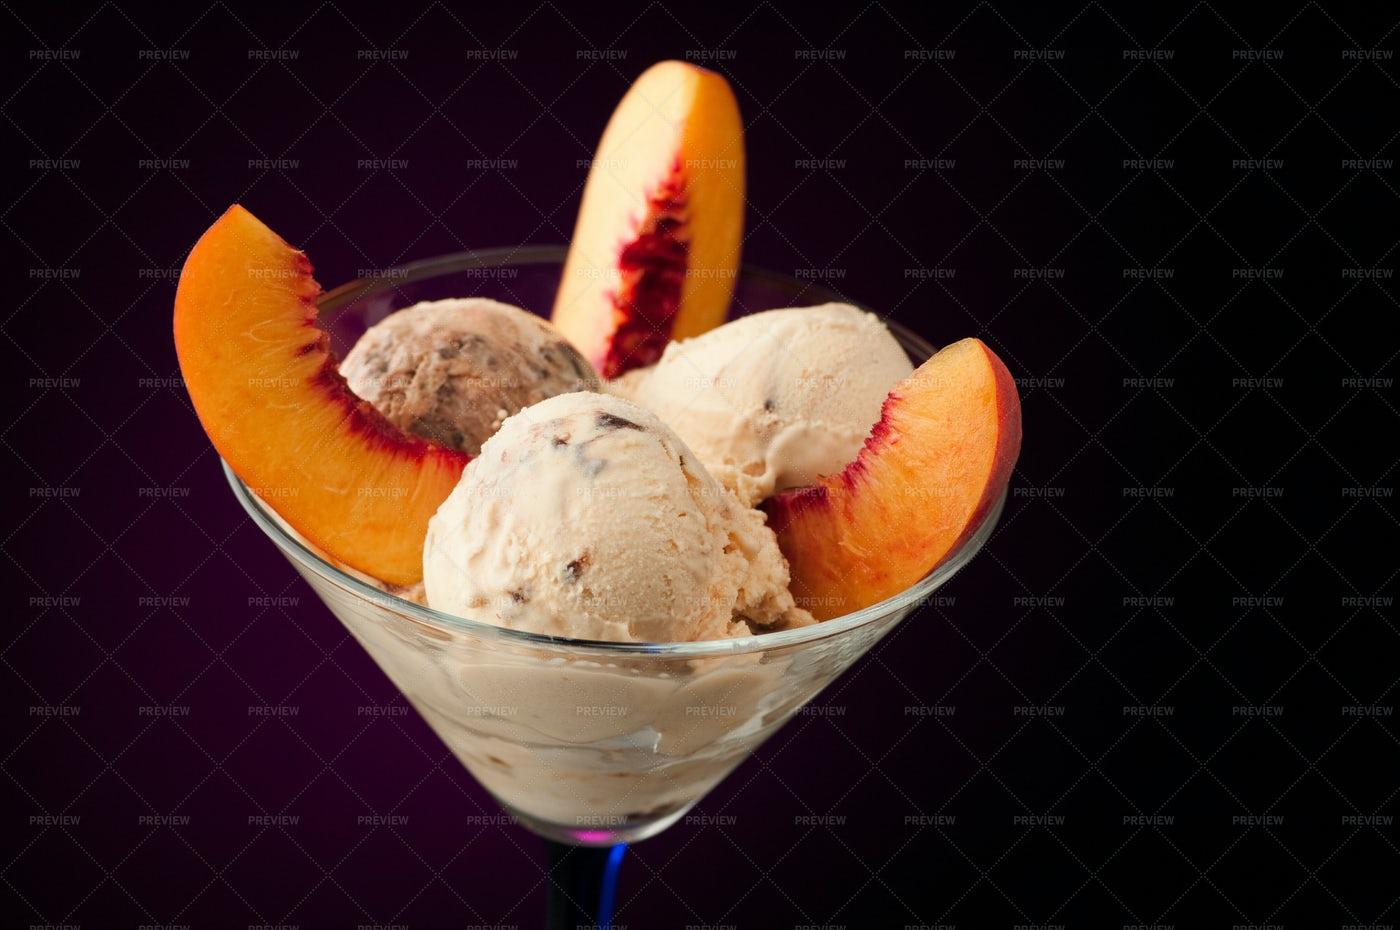 Ice Cream In A Vase: Stock Photos